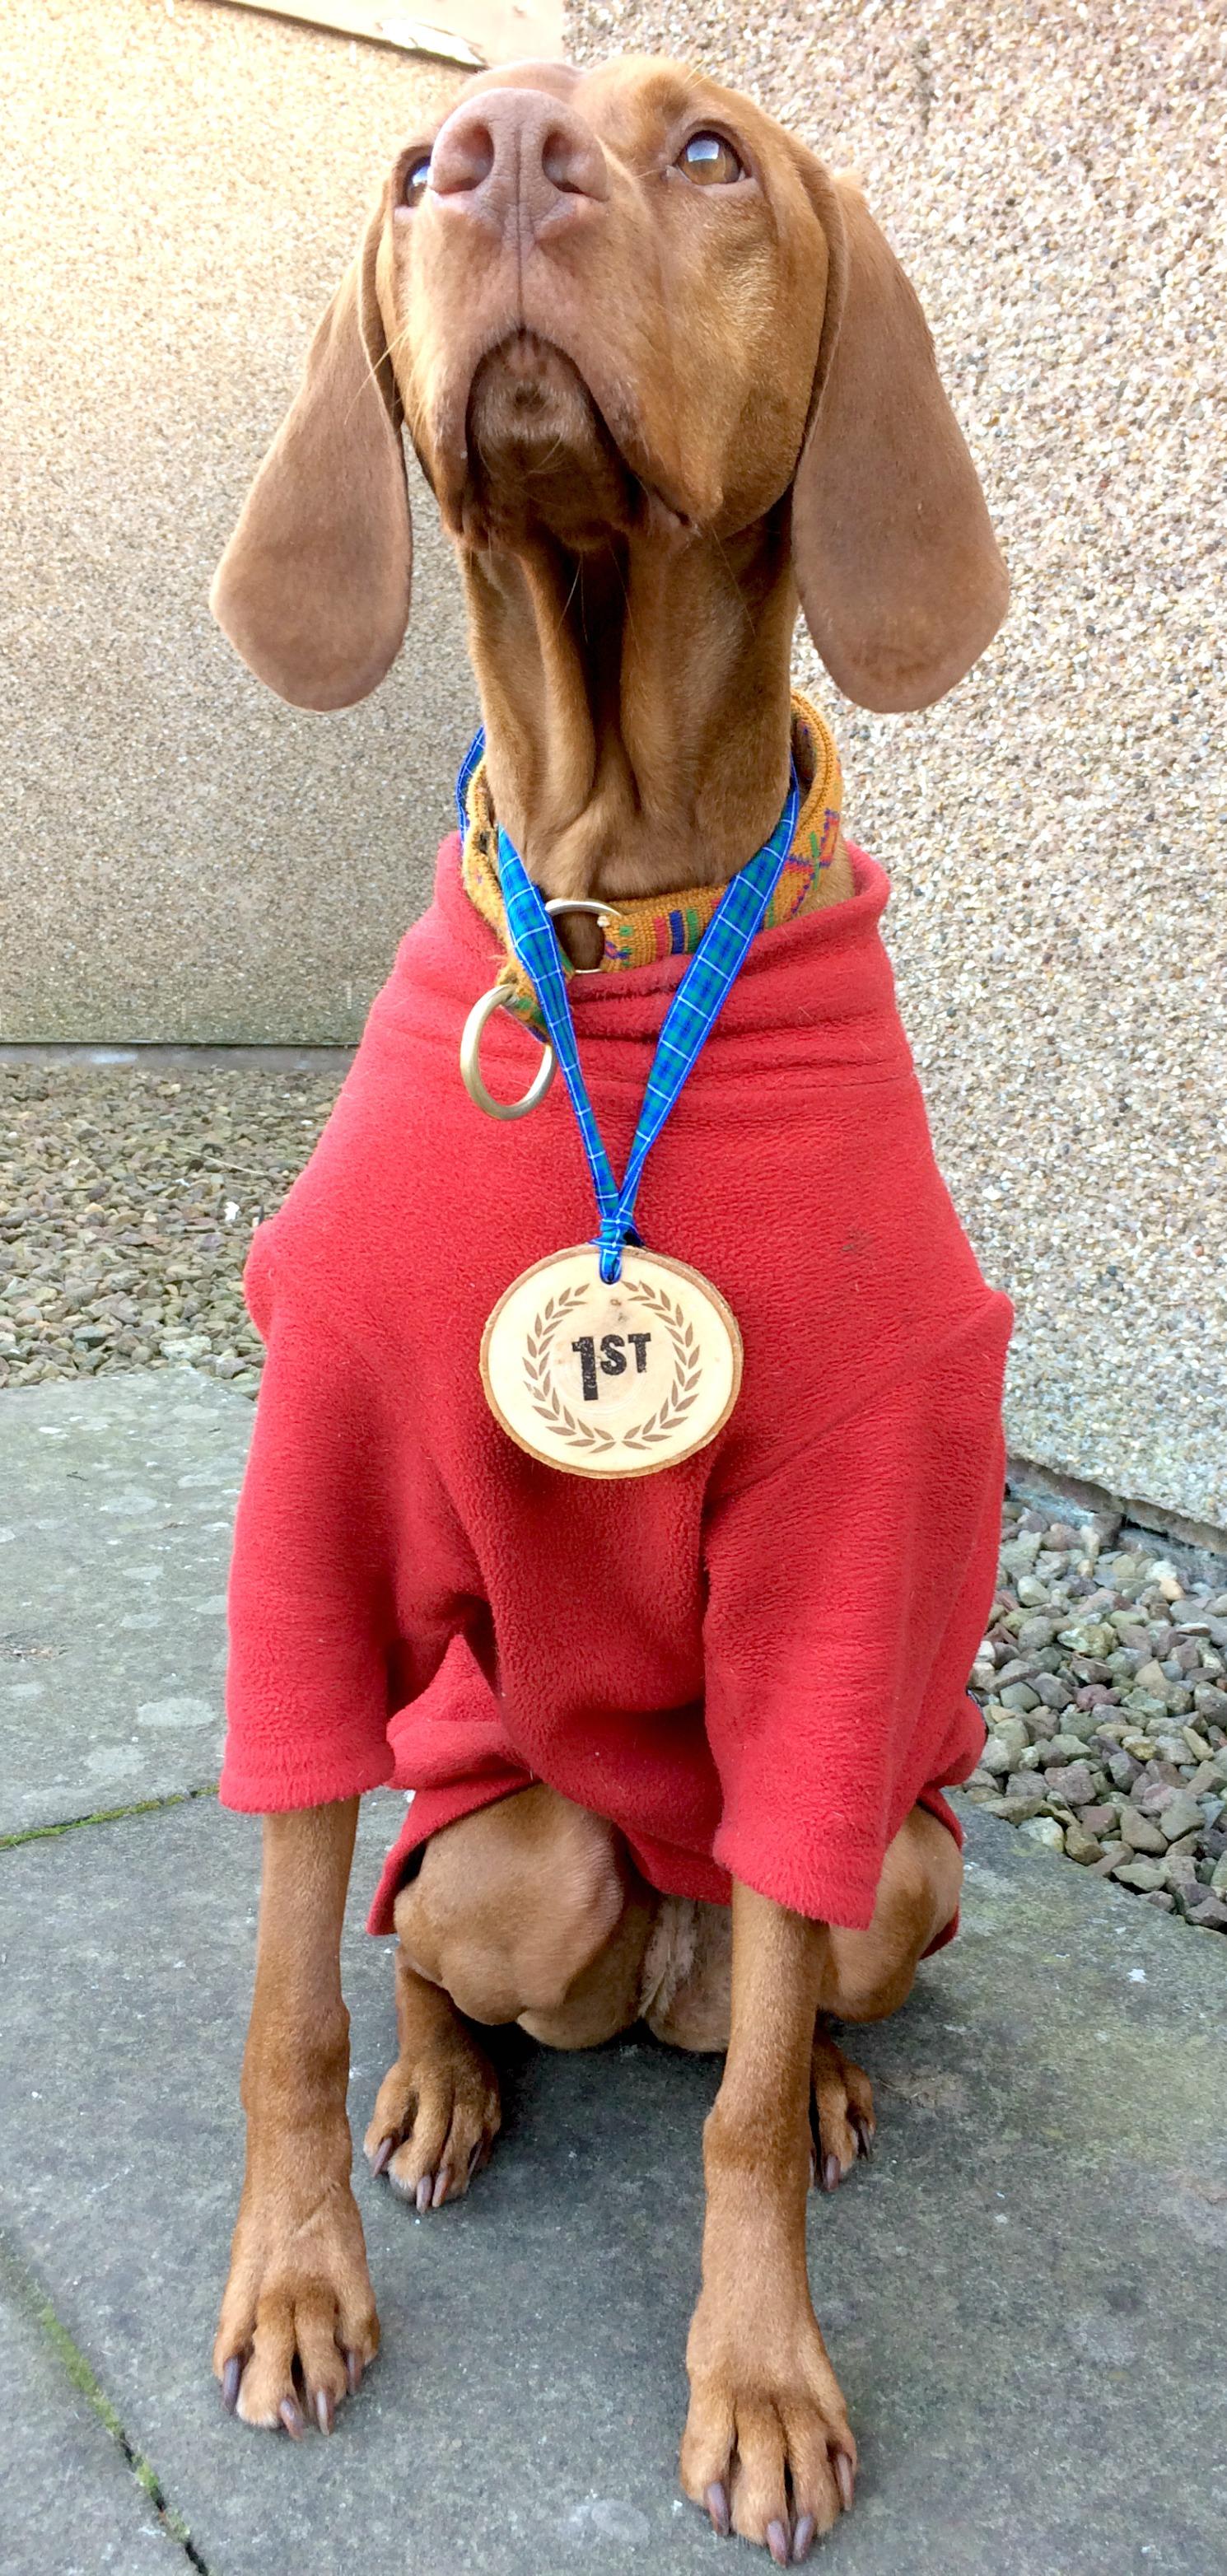 Princess Jasper is a great medal model